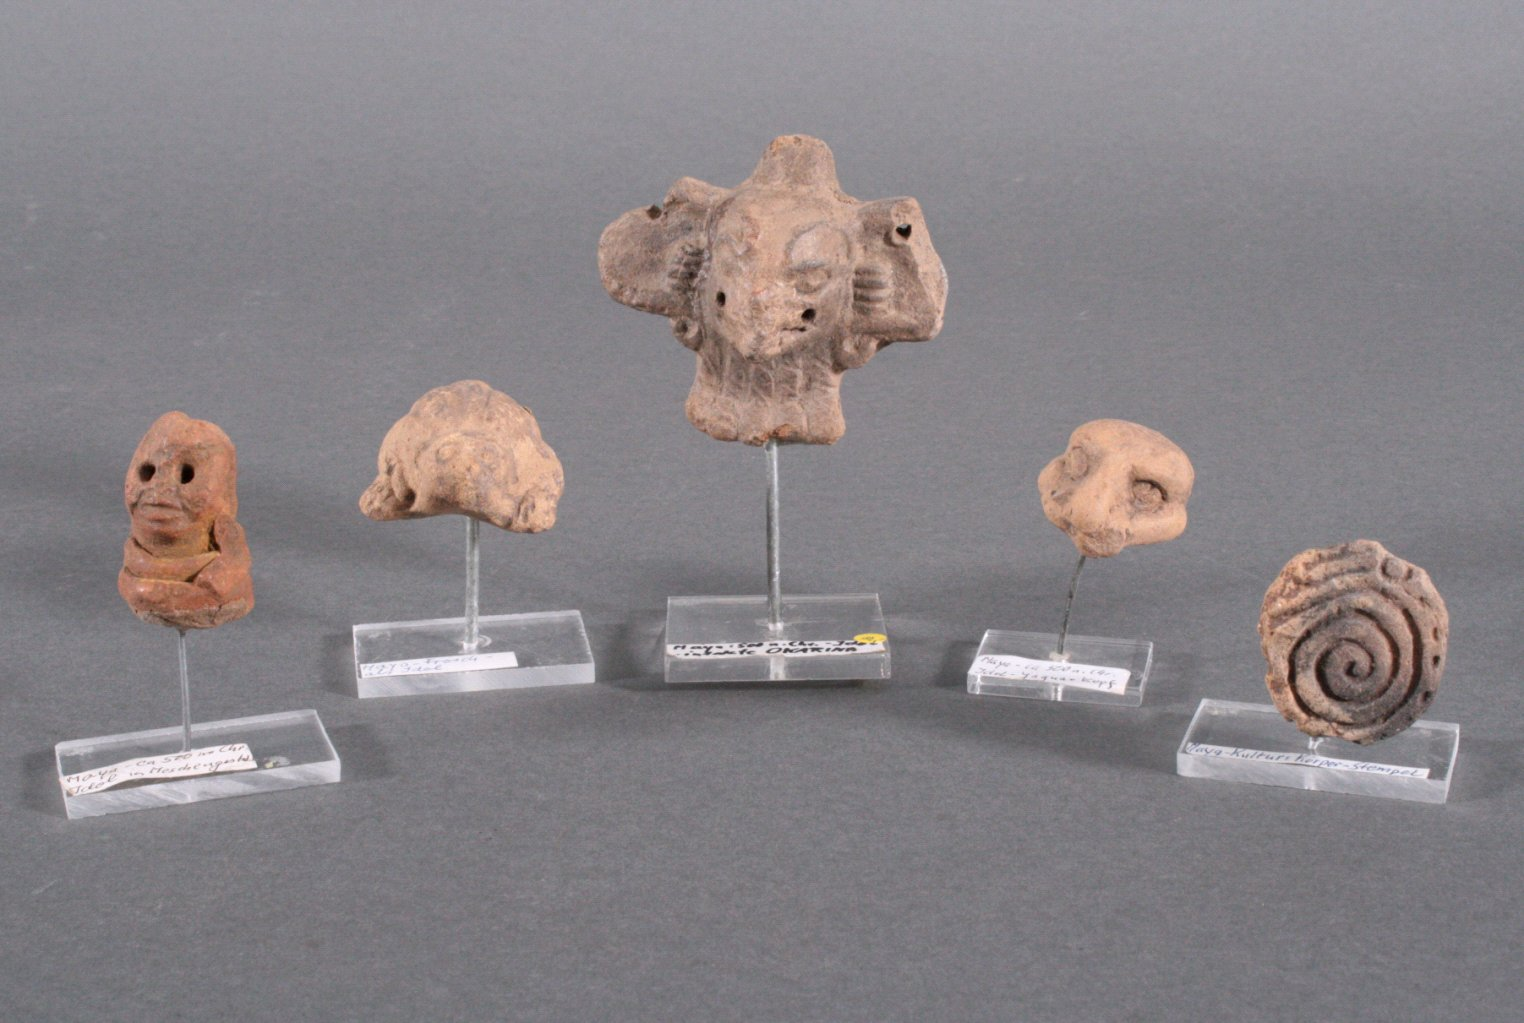 5 Teile der Mayakultur